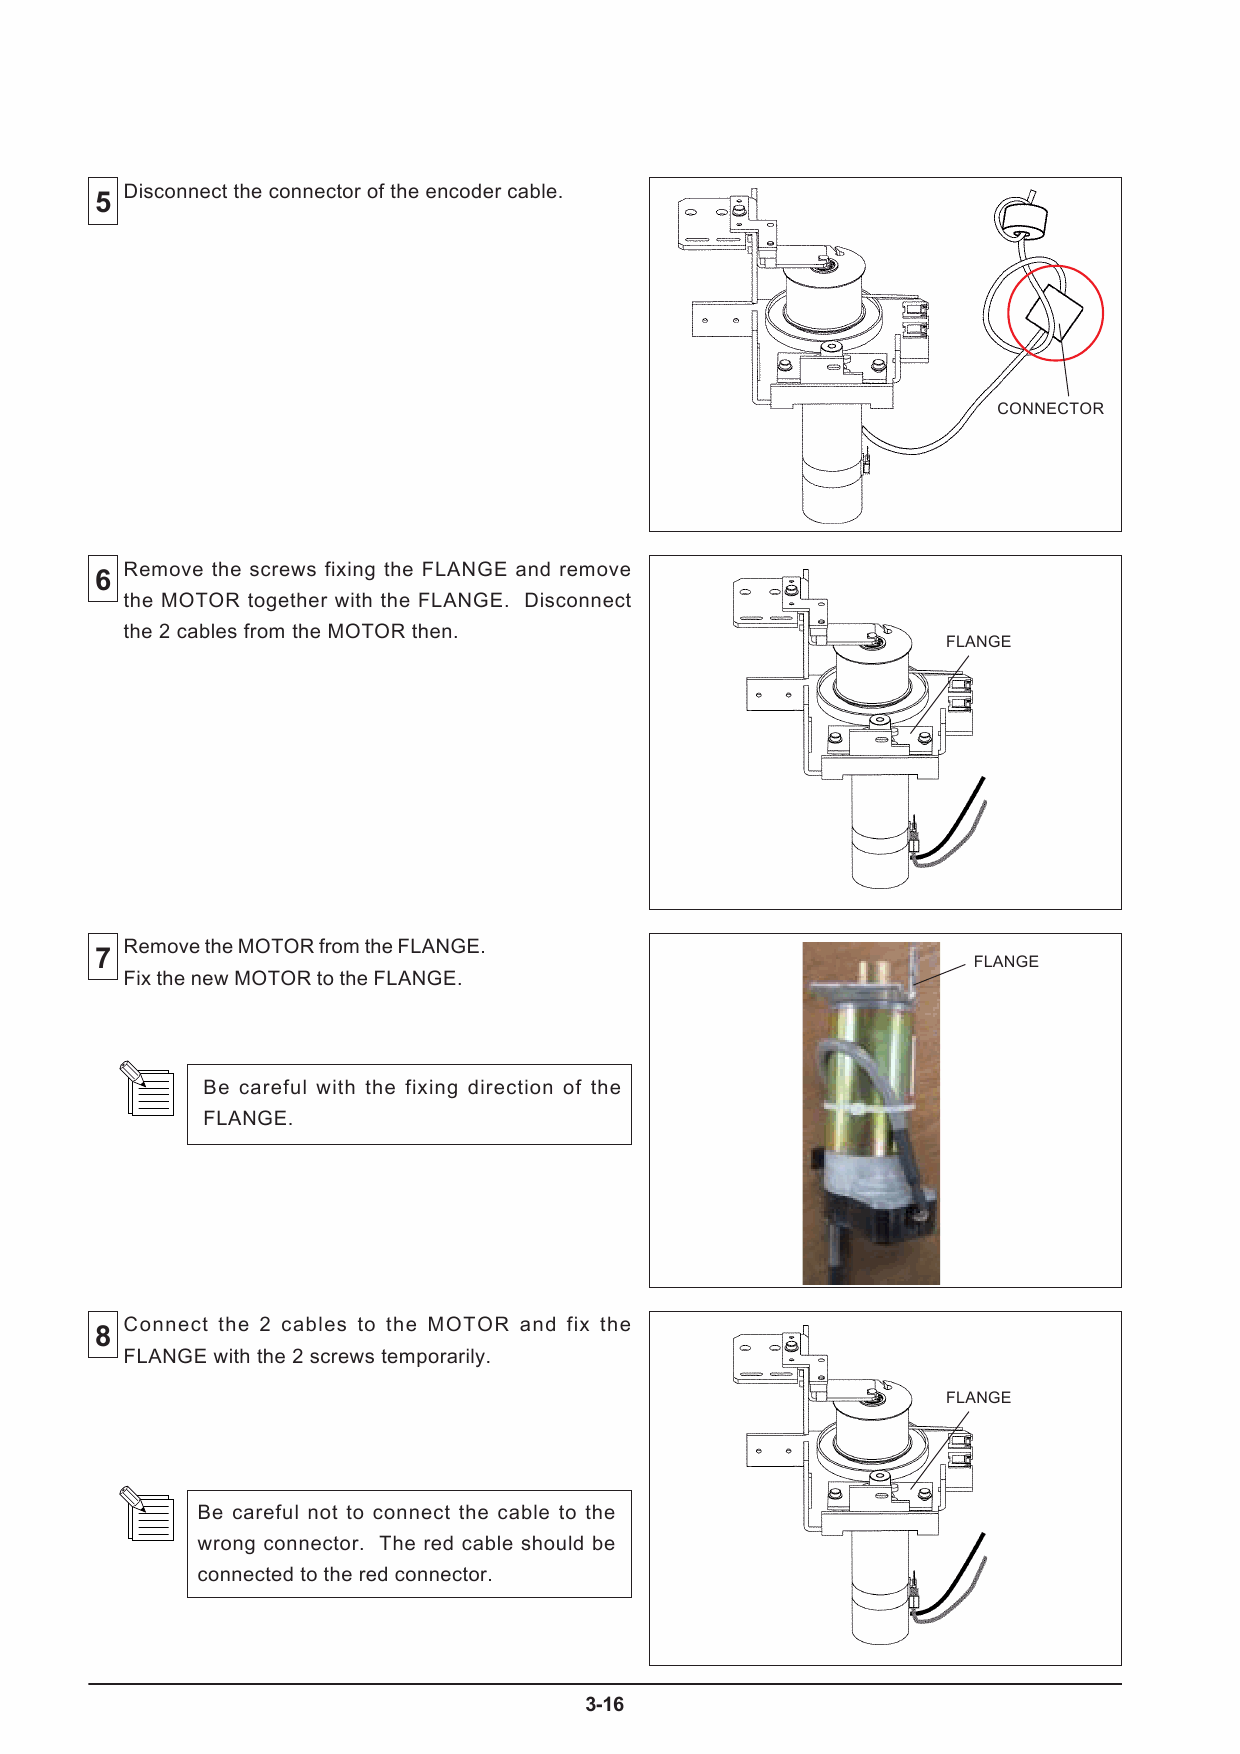 Roland Sj 645ex Service Notes Auto Electrical Wiring Diagram 36 Volt Hyundai 3rtm00206 Soljet